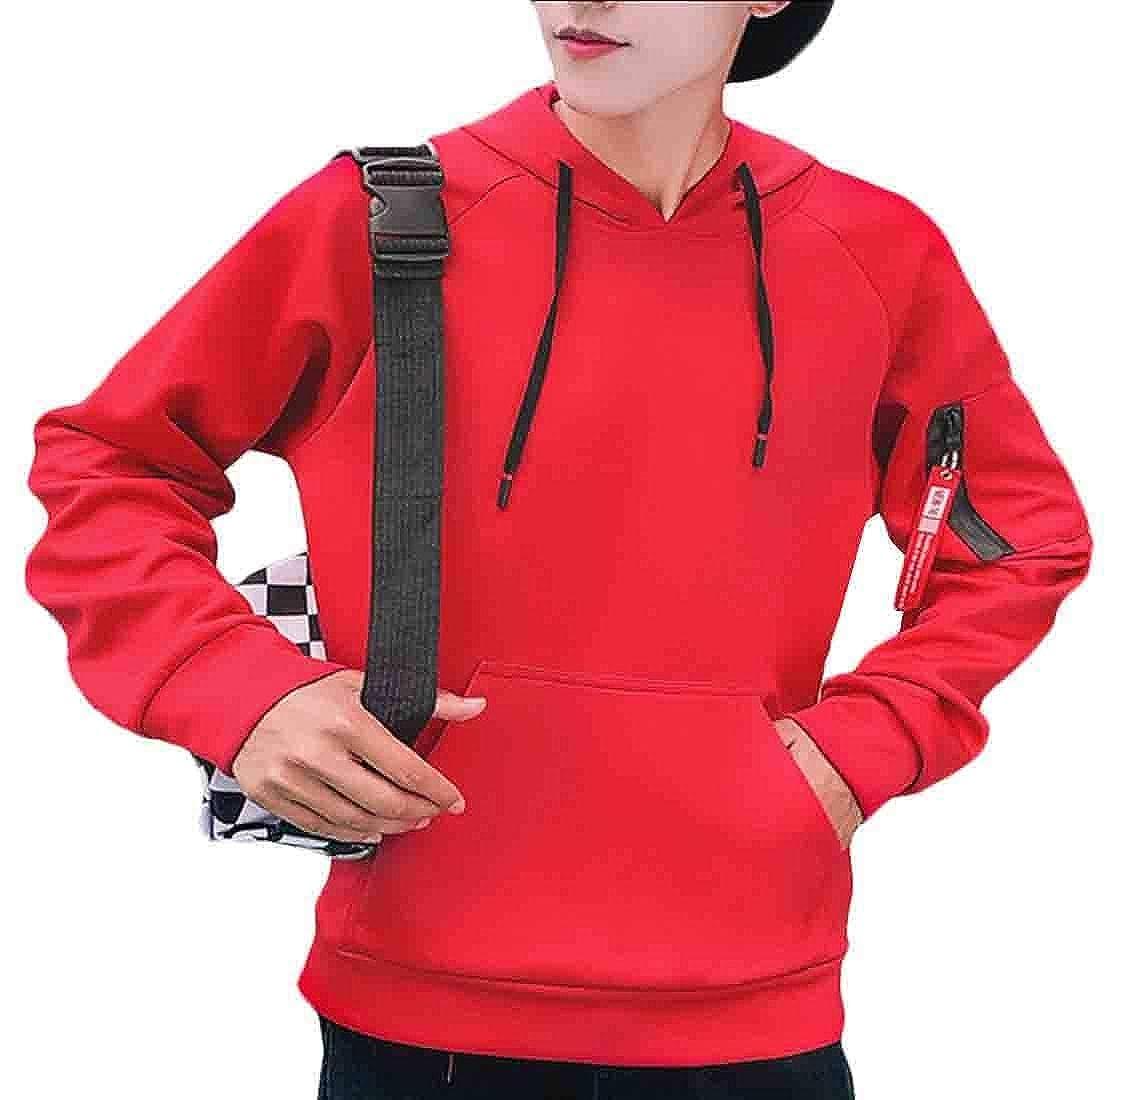 UNINUKOO Unko T Shirt Mens Sweatshirt Coats Long-Sleeved Hooded Pullover Slim Tee